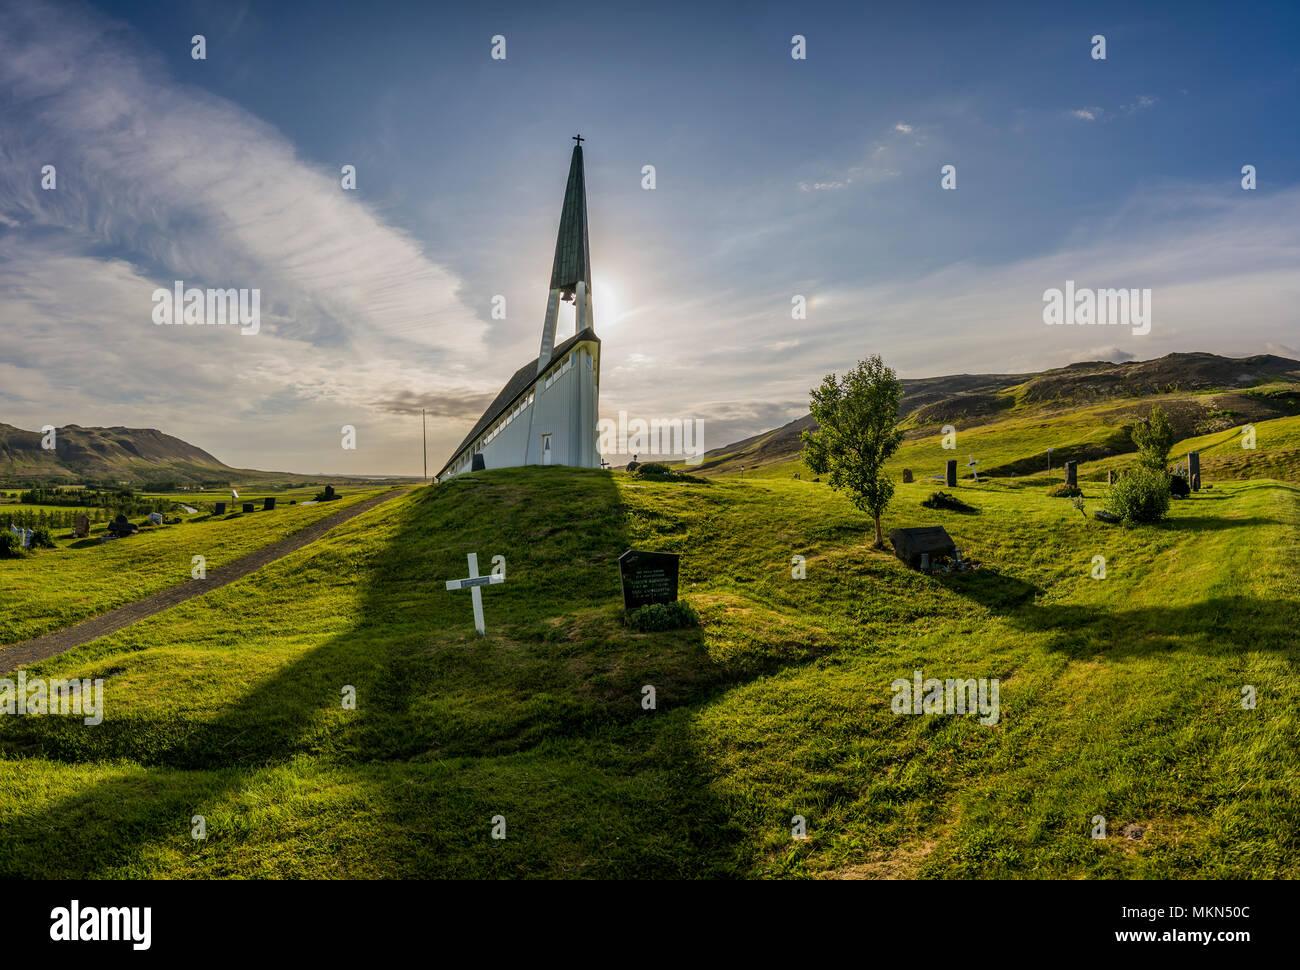 Yuri Senkevich: Who went beyond the horizon